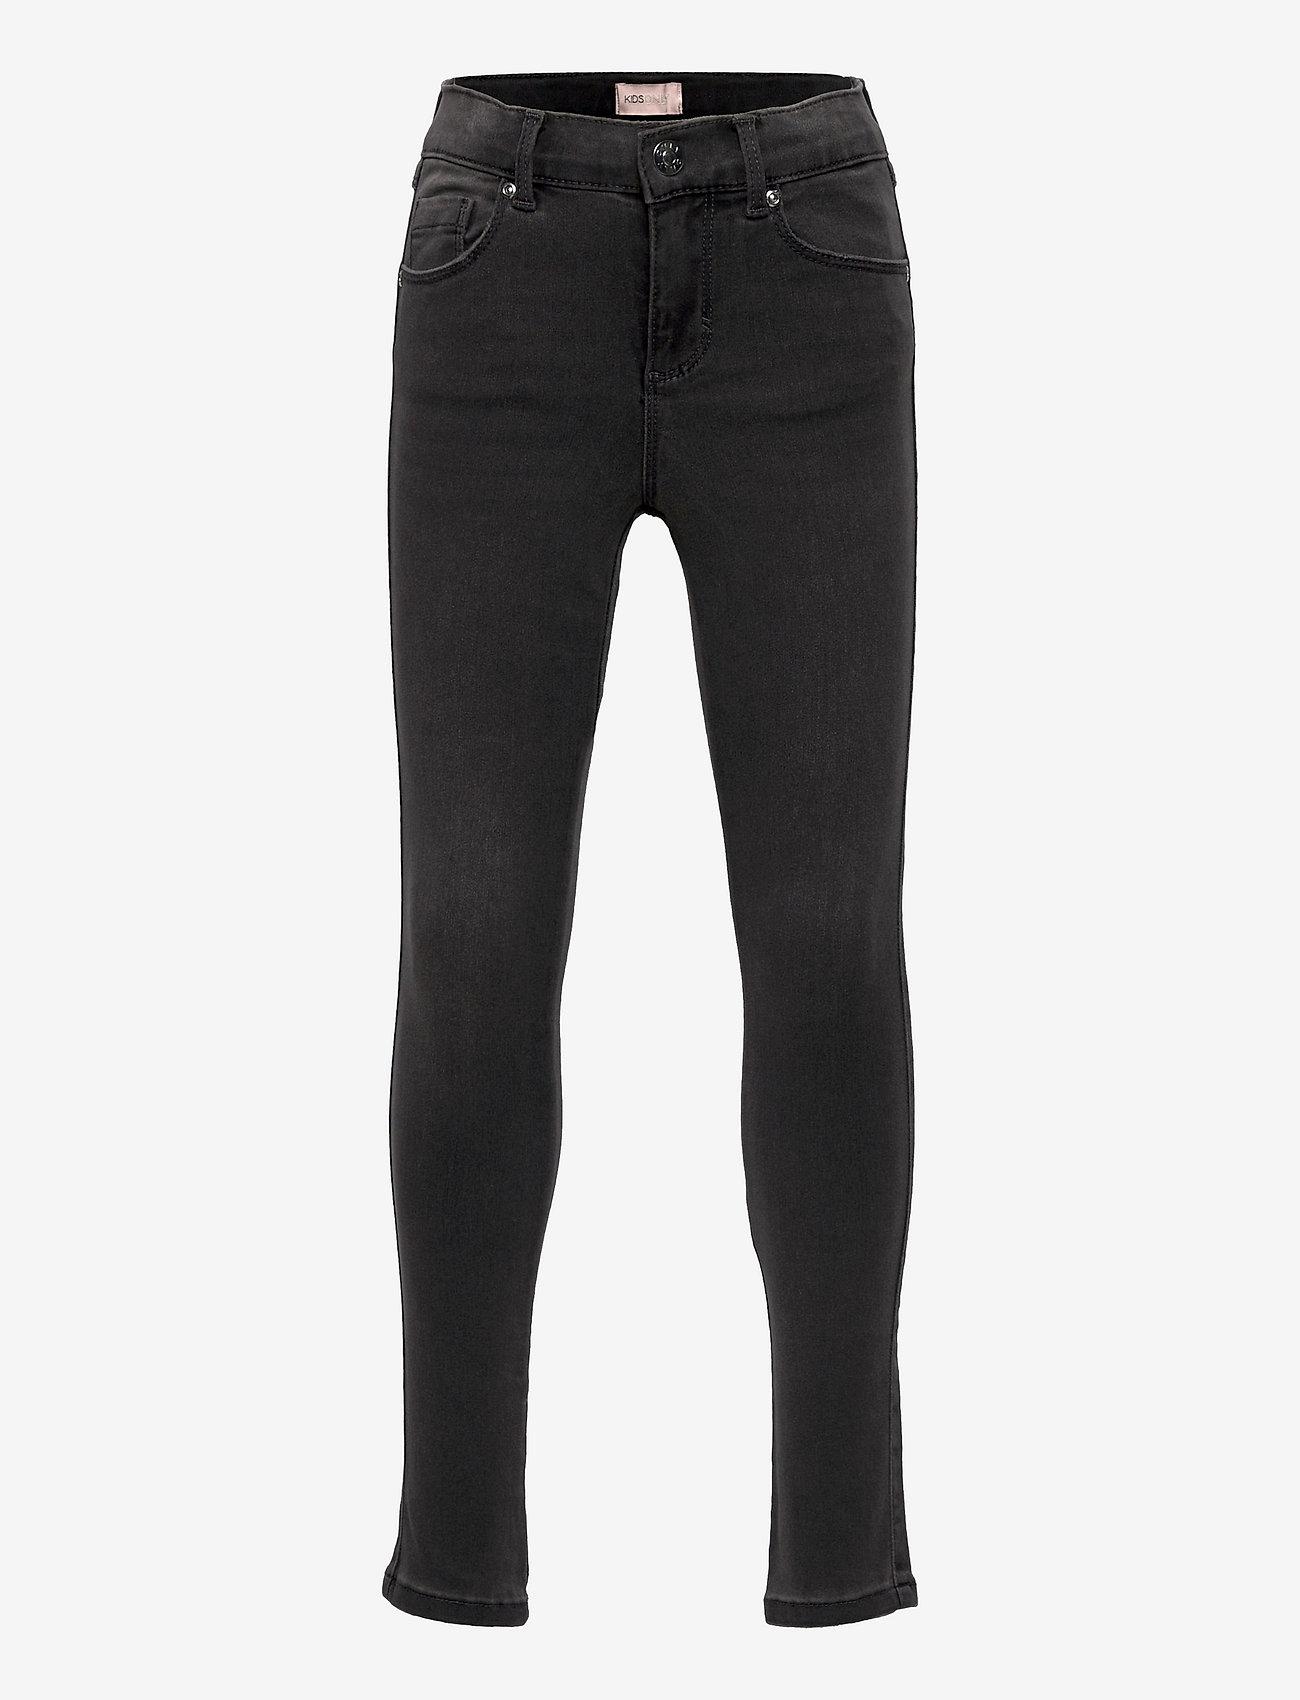 Kids Only - KONROYAL LIFE REG SKINNY BJ312 - jeans - dark grey denim - 0